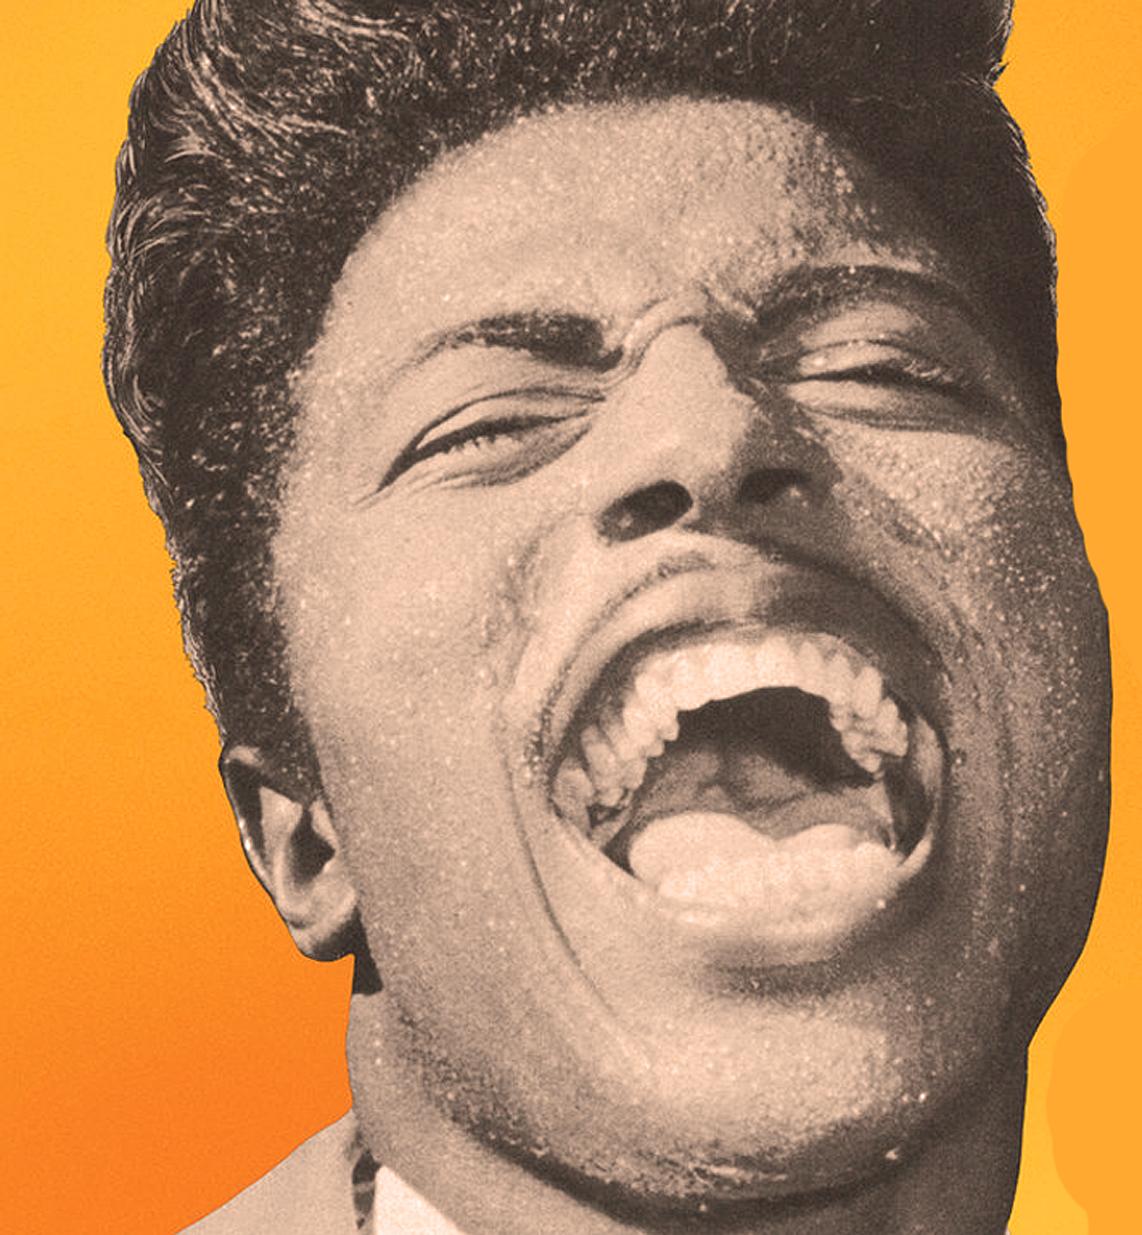 Little Richard Talks About Little Richard – KRTH-FM – 1986 – Past Daily Pop Chronicles